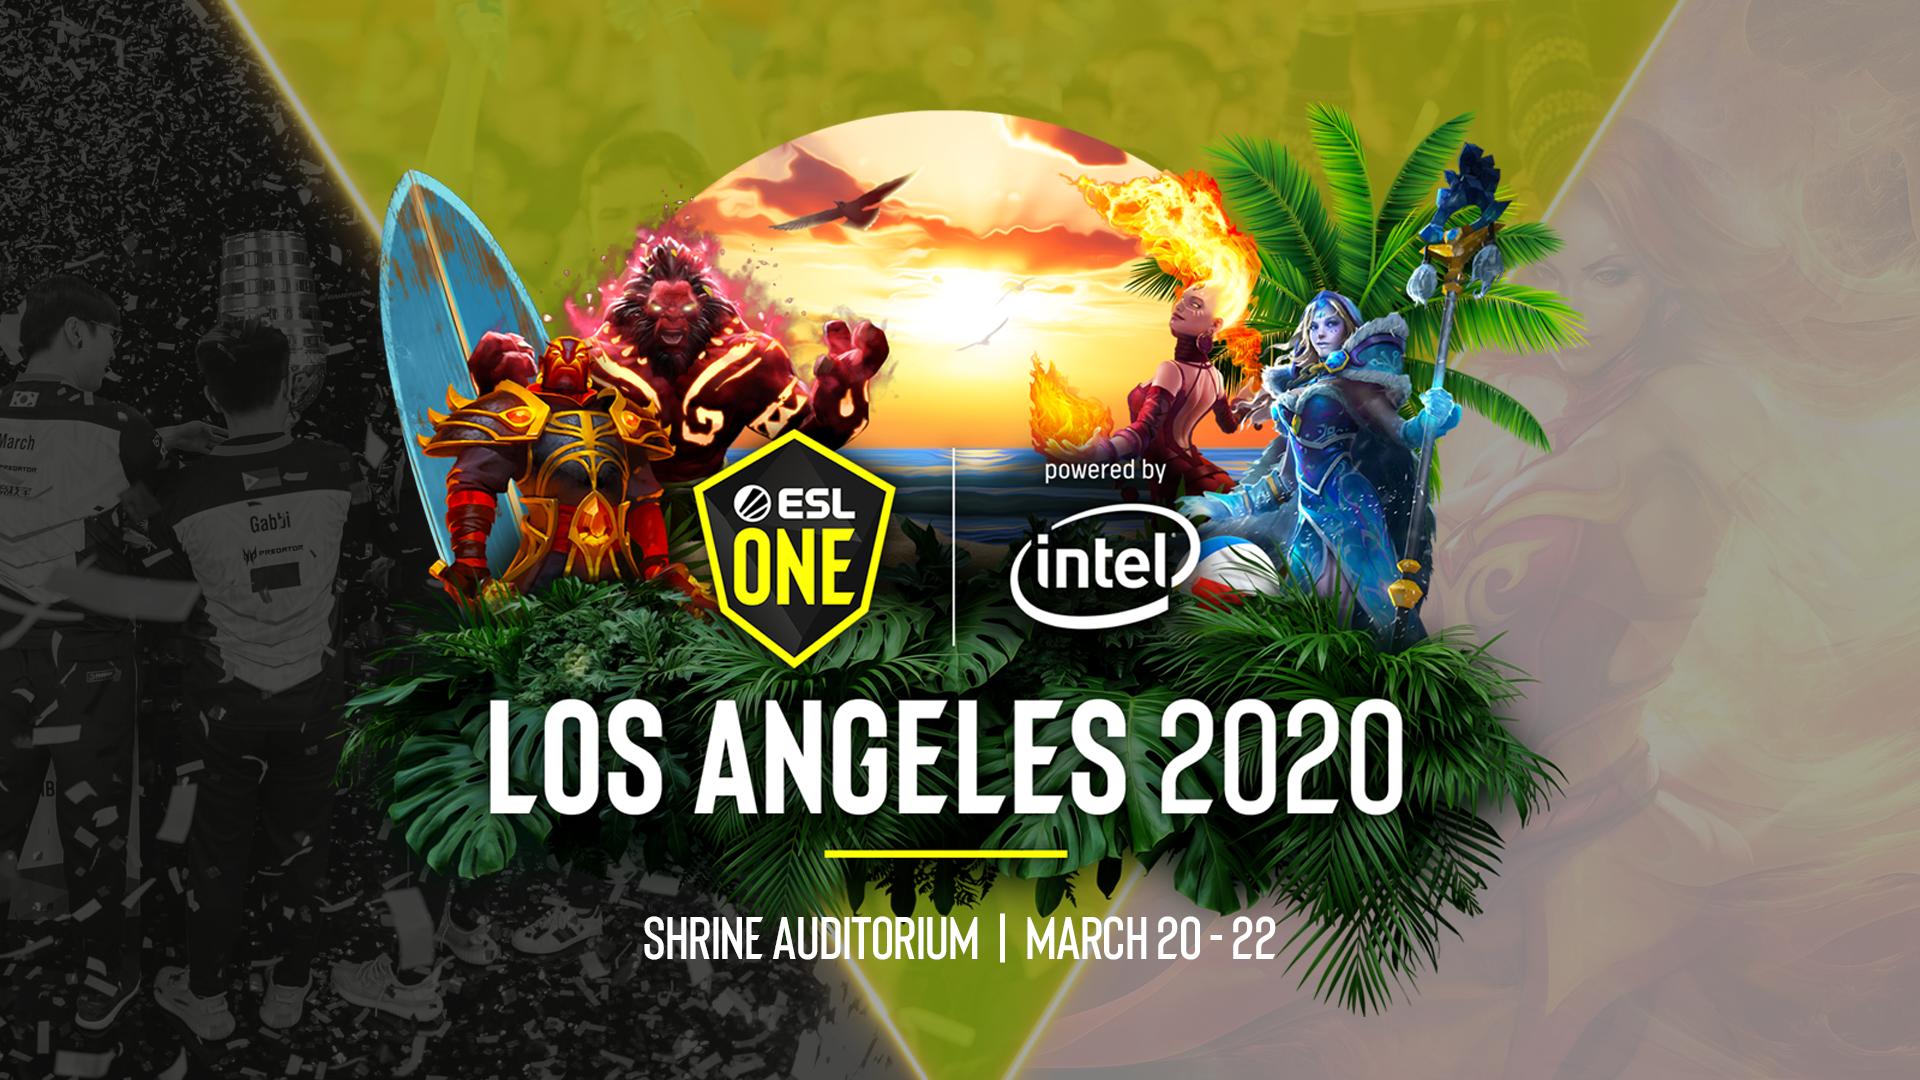 ESL One Los Angeles Dota 2